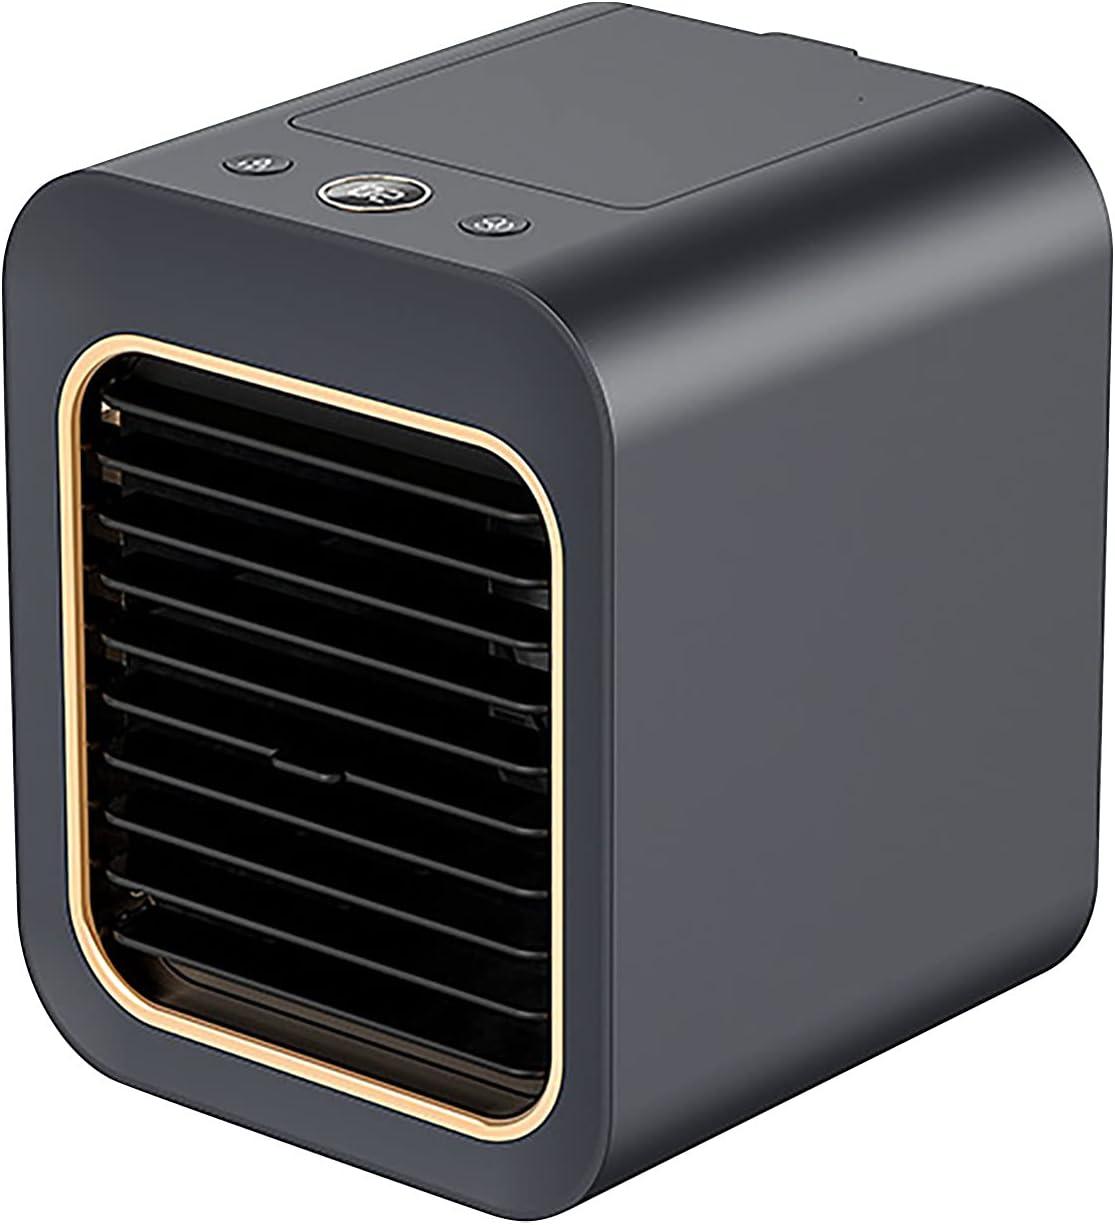 Pinklove Portable Air Conditioner Regular dealer List price for Mini Personal Bedroom